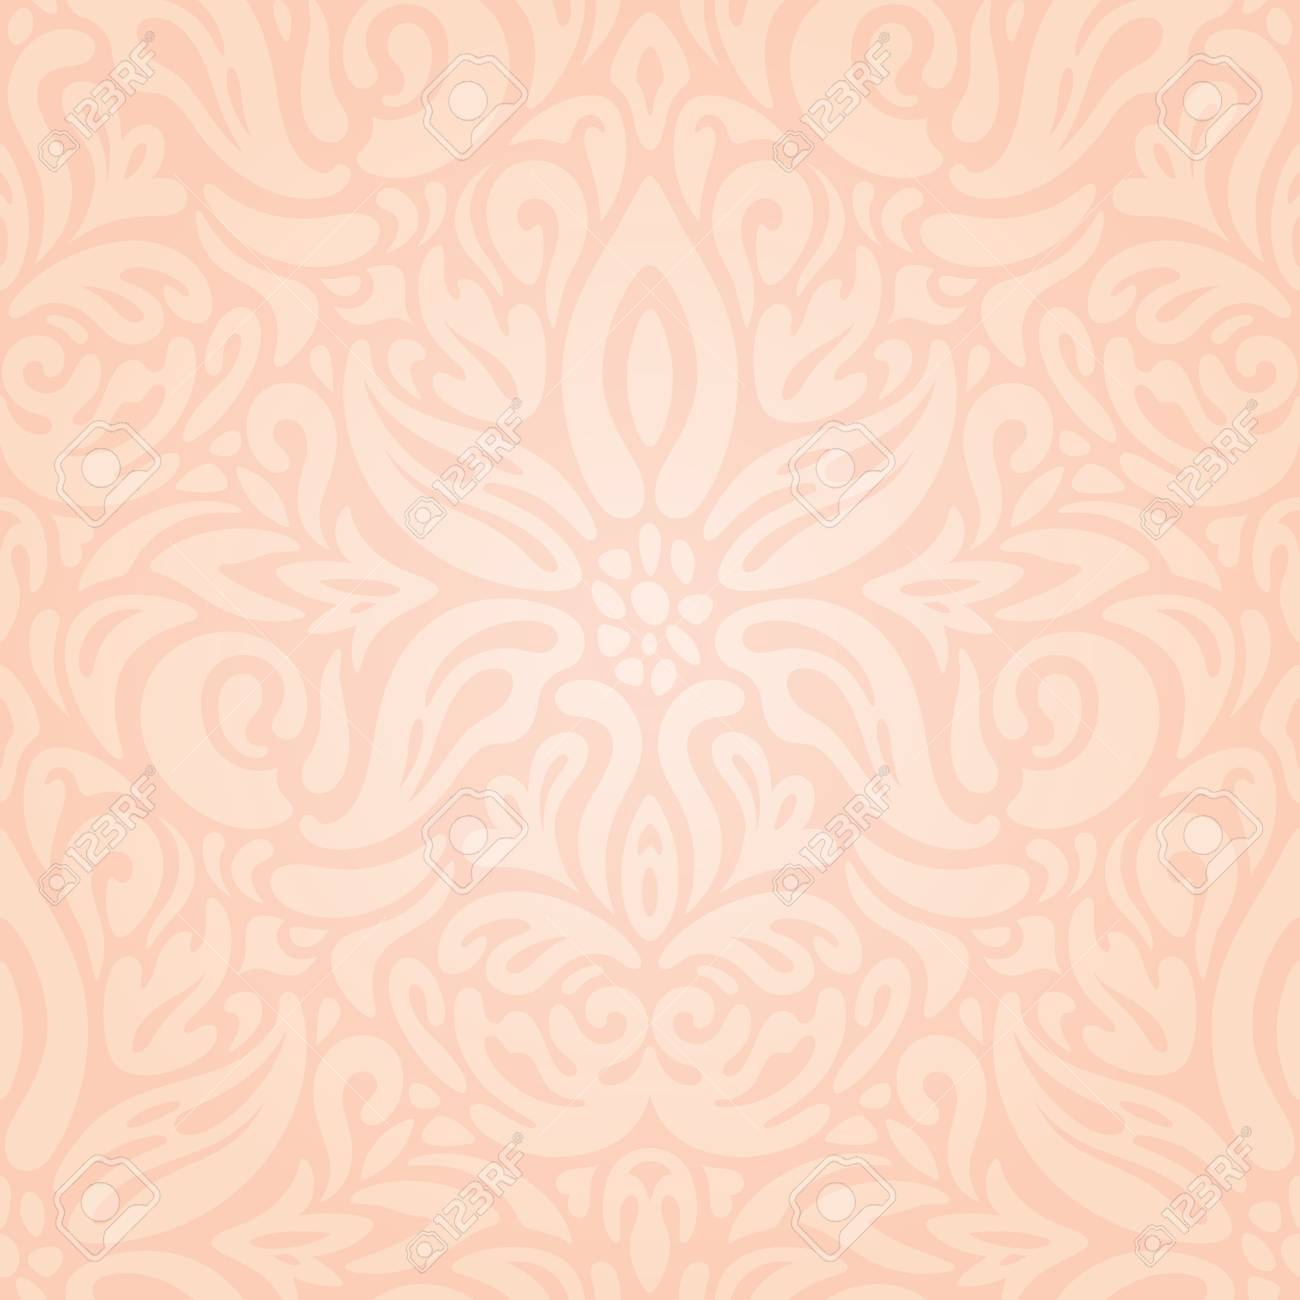 Wedding Floral Pale Ecru Pale Peach Decorative Vintage Pattern